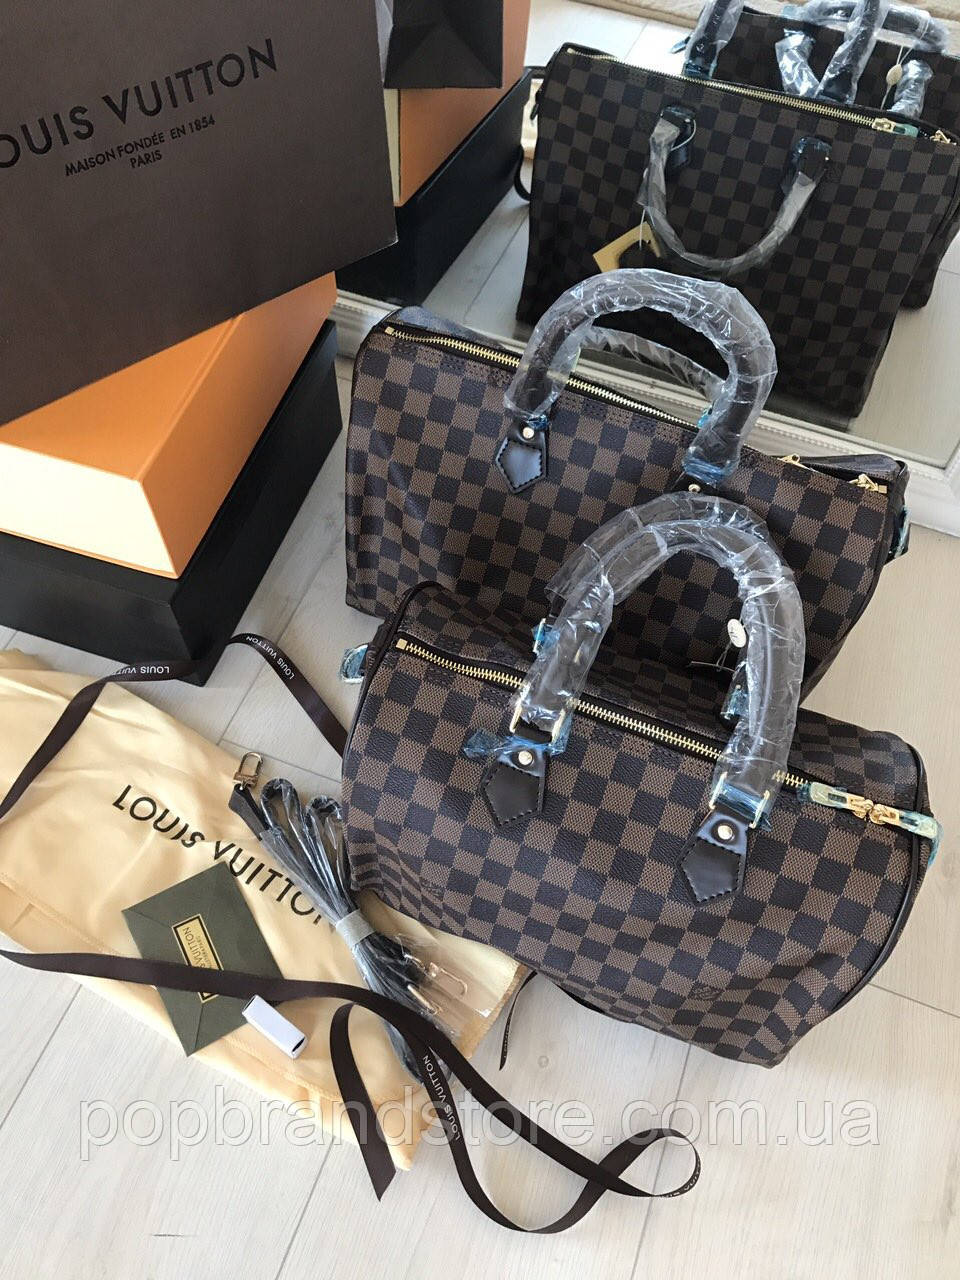 a0f1e3f4f7ee Стильная женская сумка LOUIS VUITTON SPEEDY DAMIER 30 см (реплика ...